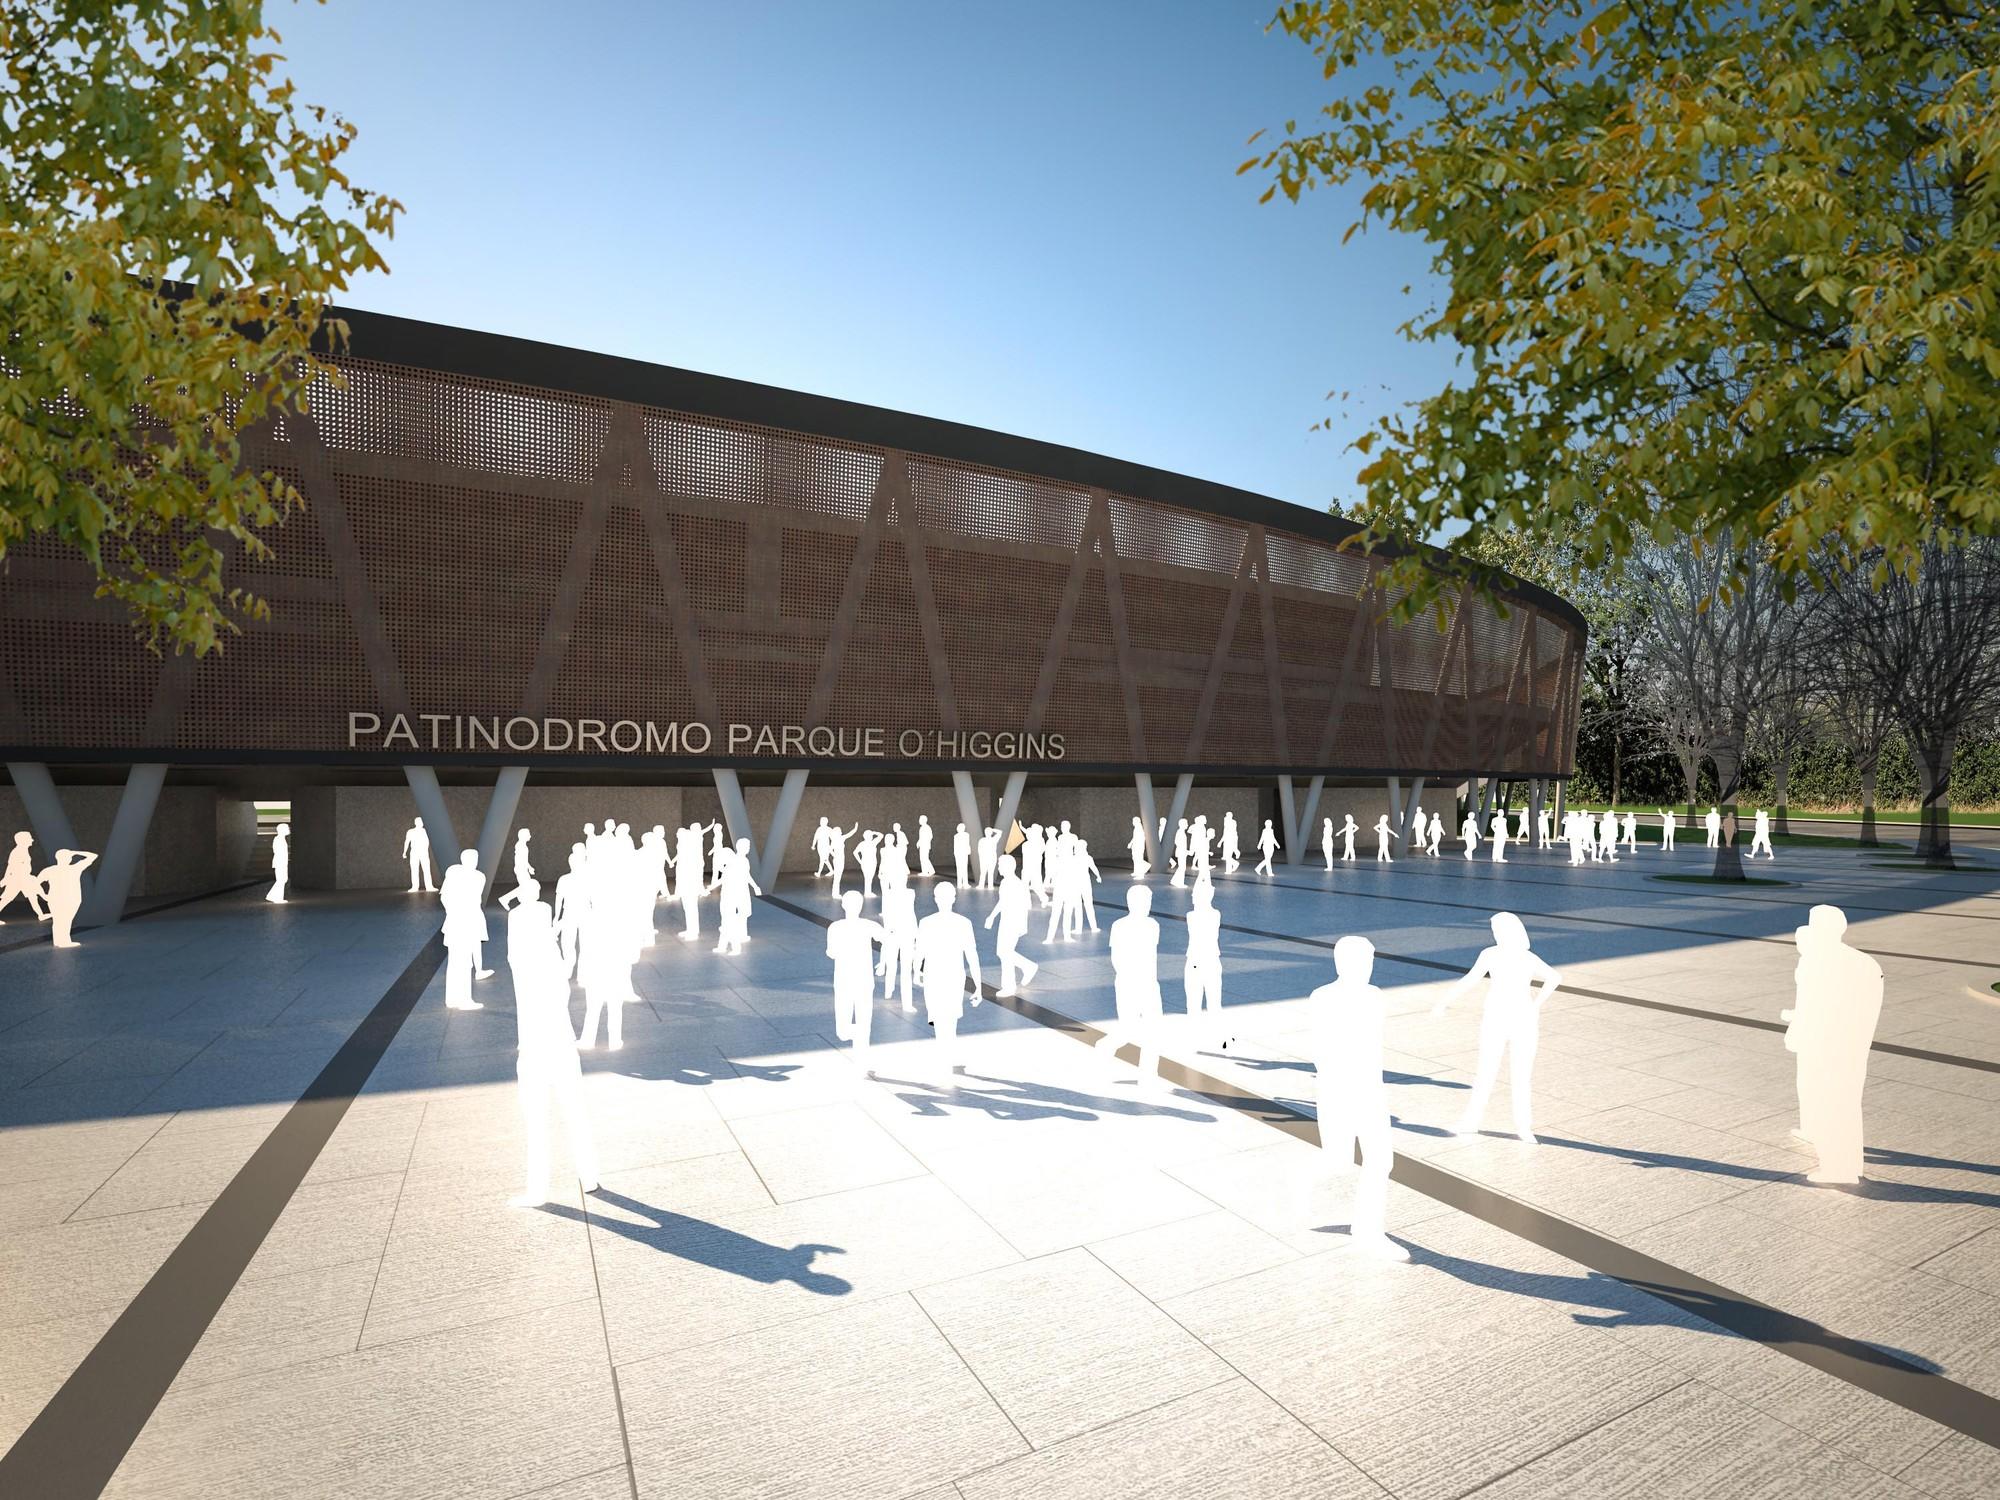 Primer Lugar Concurso Patinodromo Parque O'higgins, Santiago, Courtesy of PLAN Arquitectos